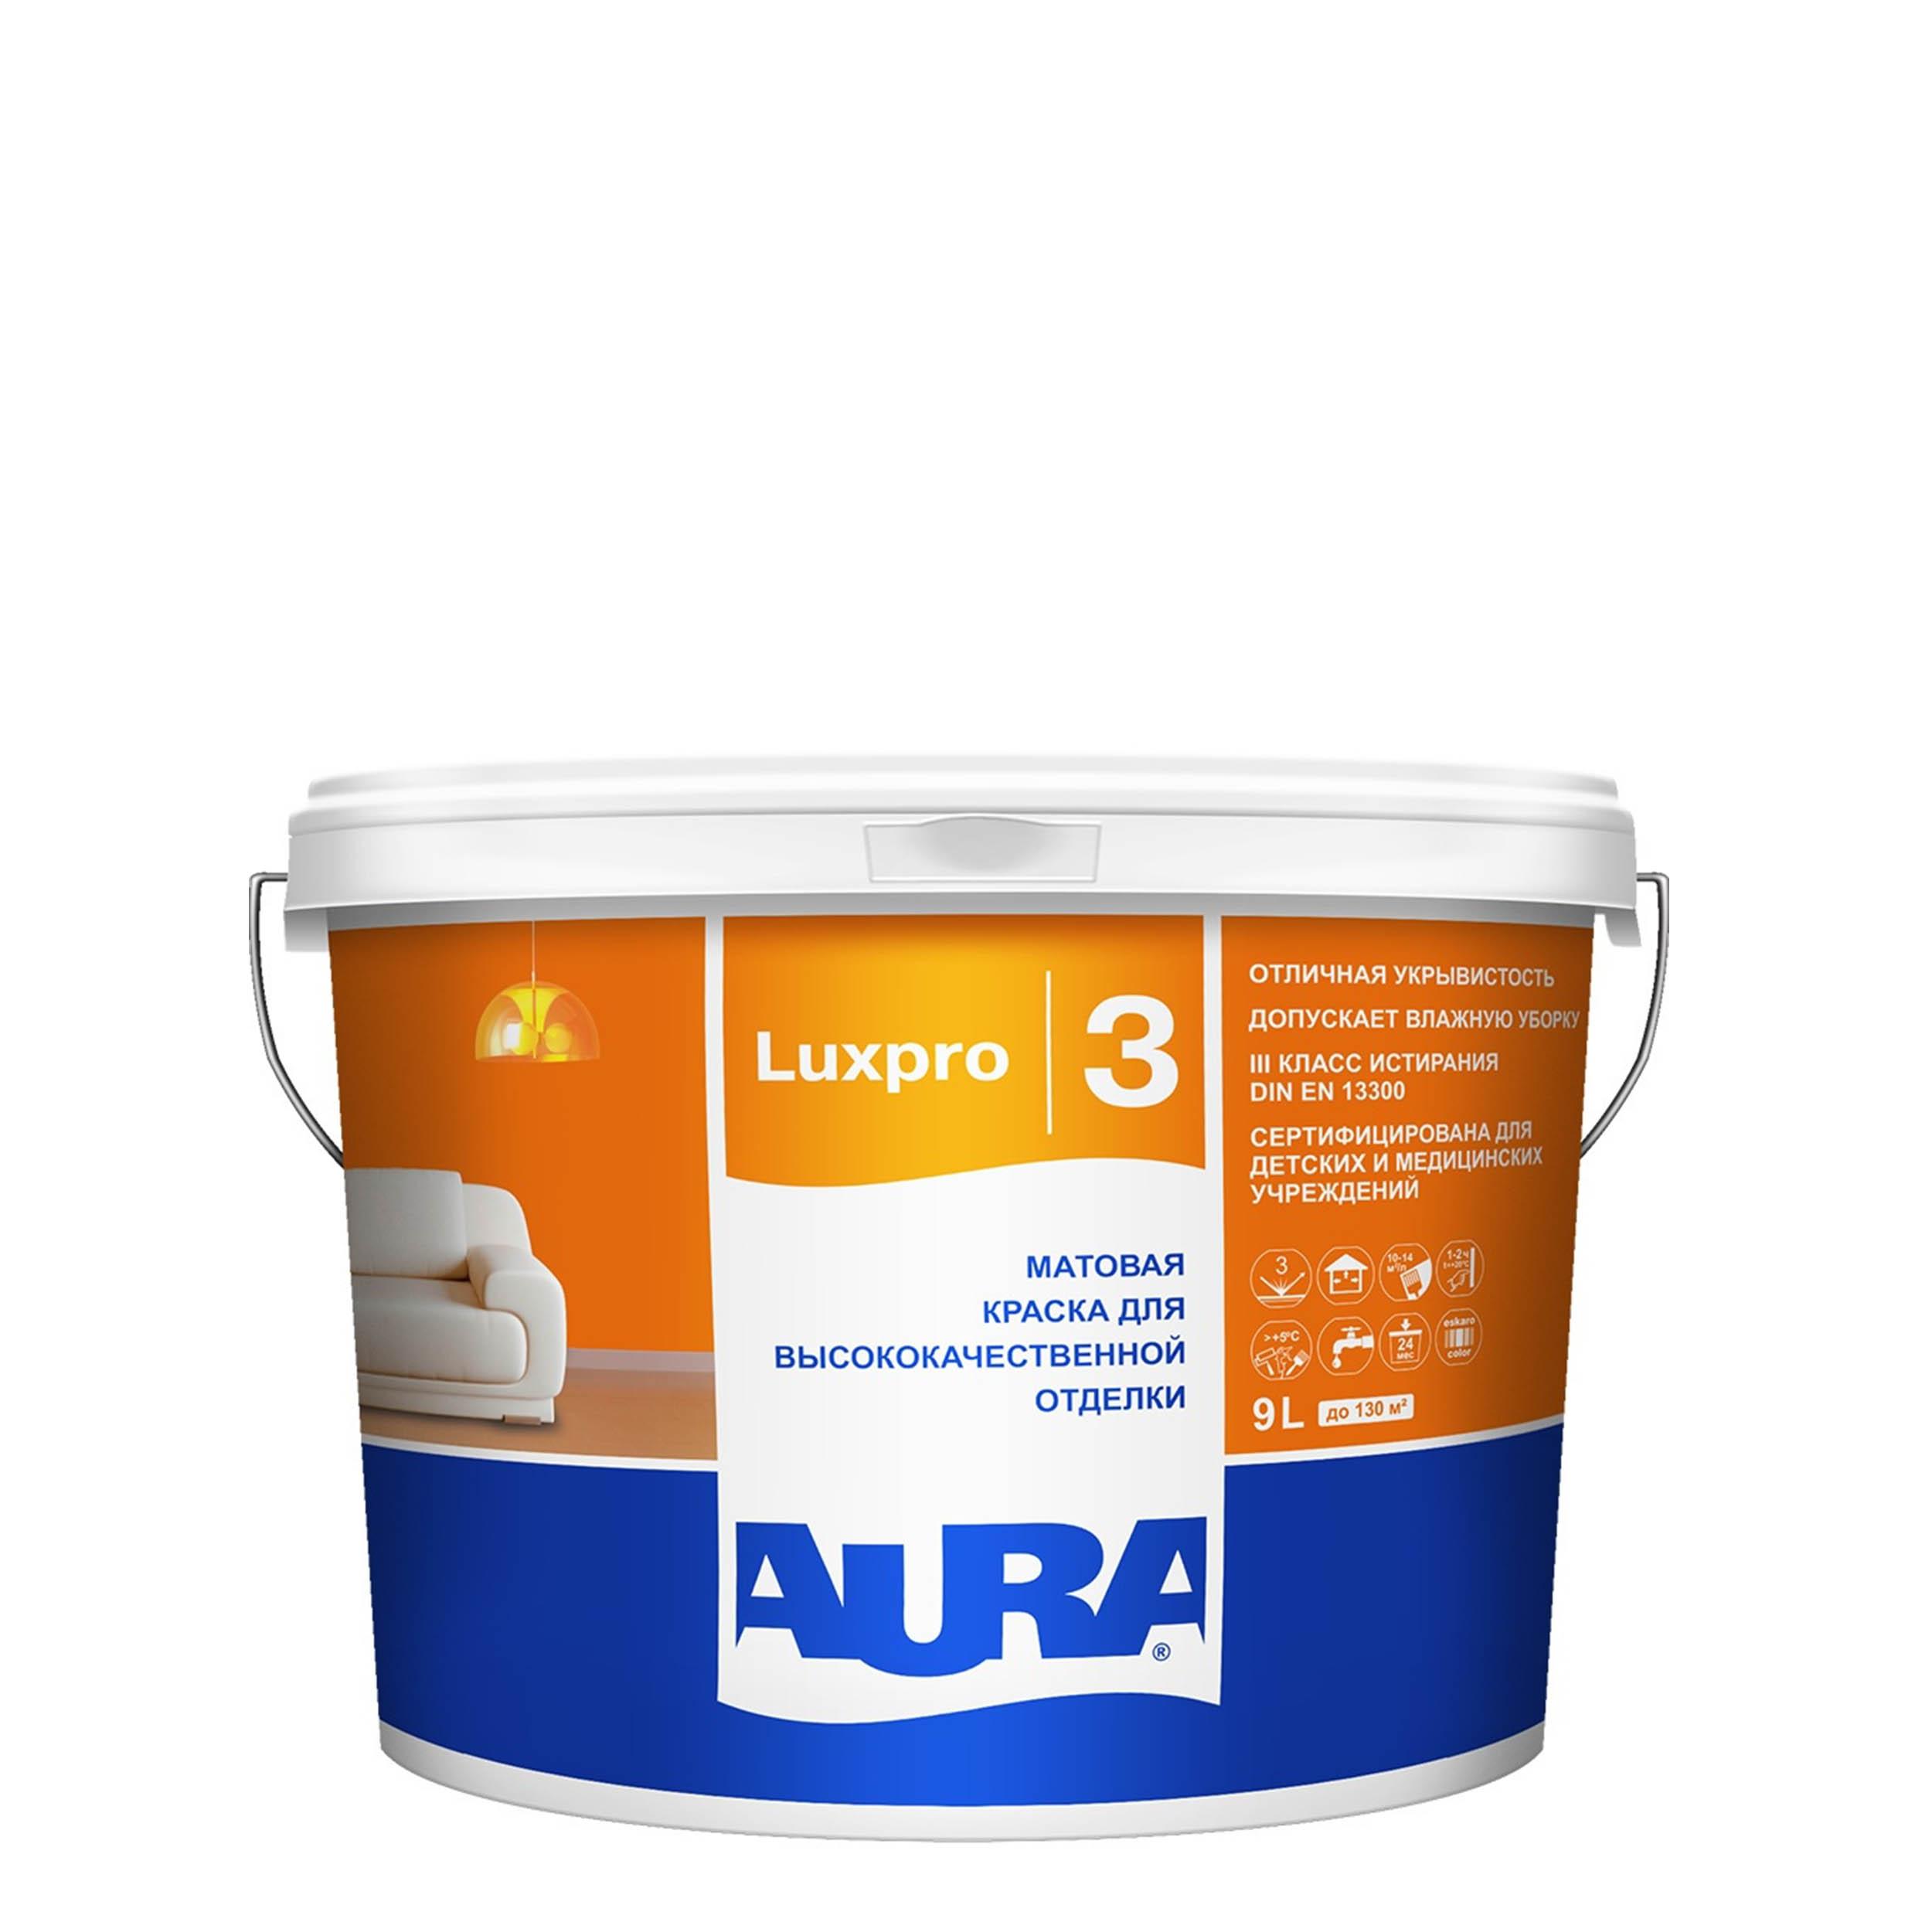 Фото 3 - Краска интерьерная, Aura LuxPRO 3, RAL 8028, 11 кг.